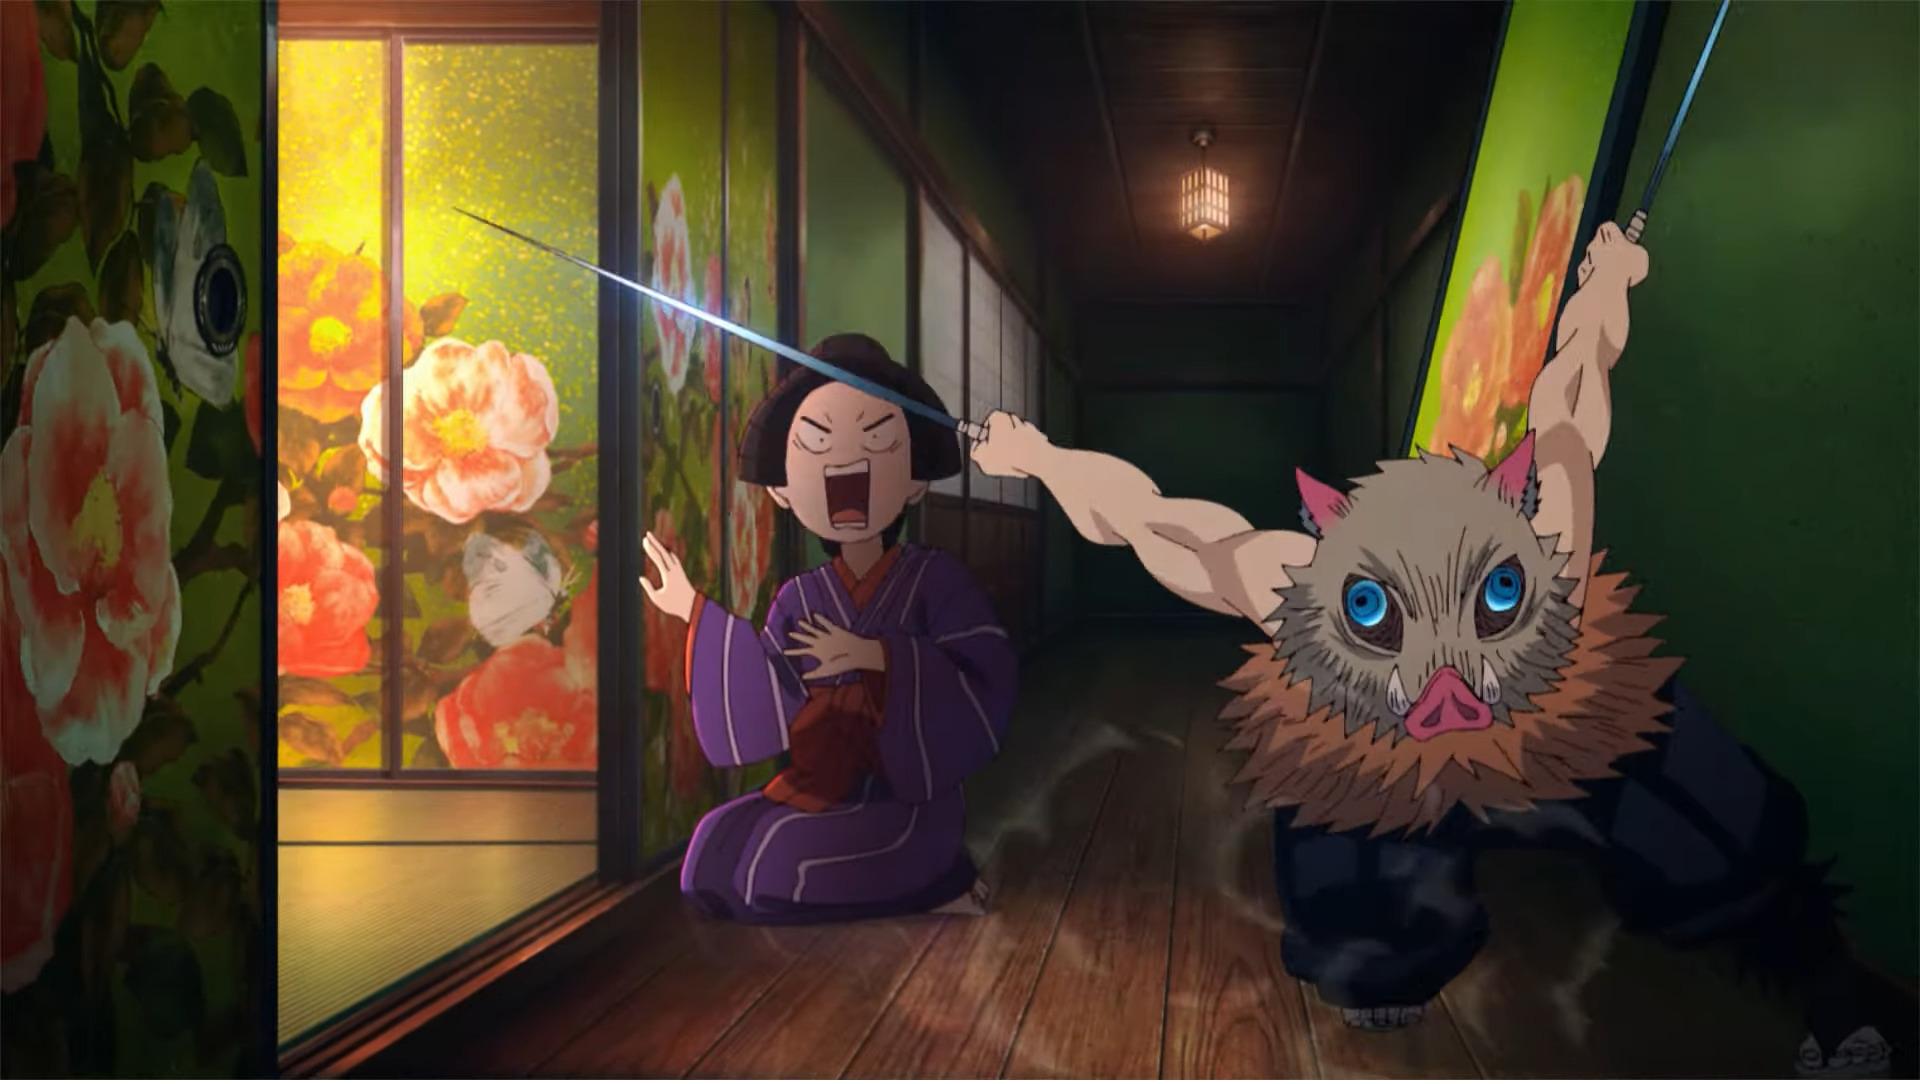 japanese parents demon slayer season 2 - trailer screenshot